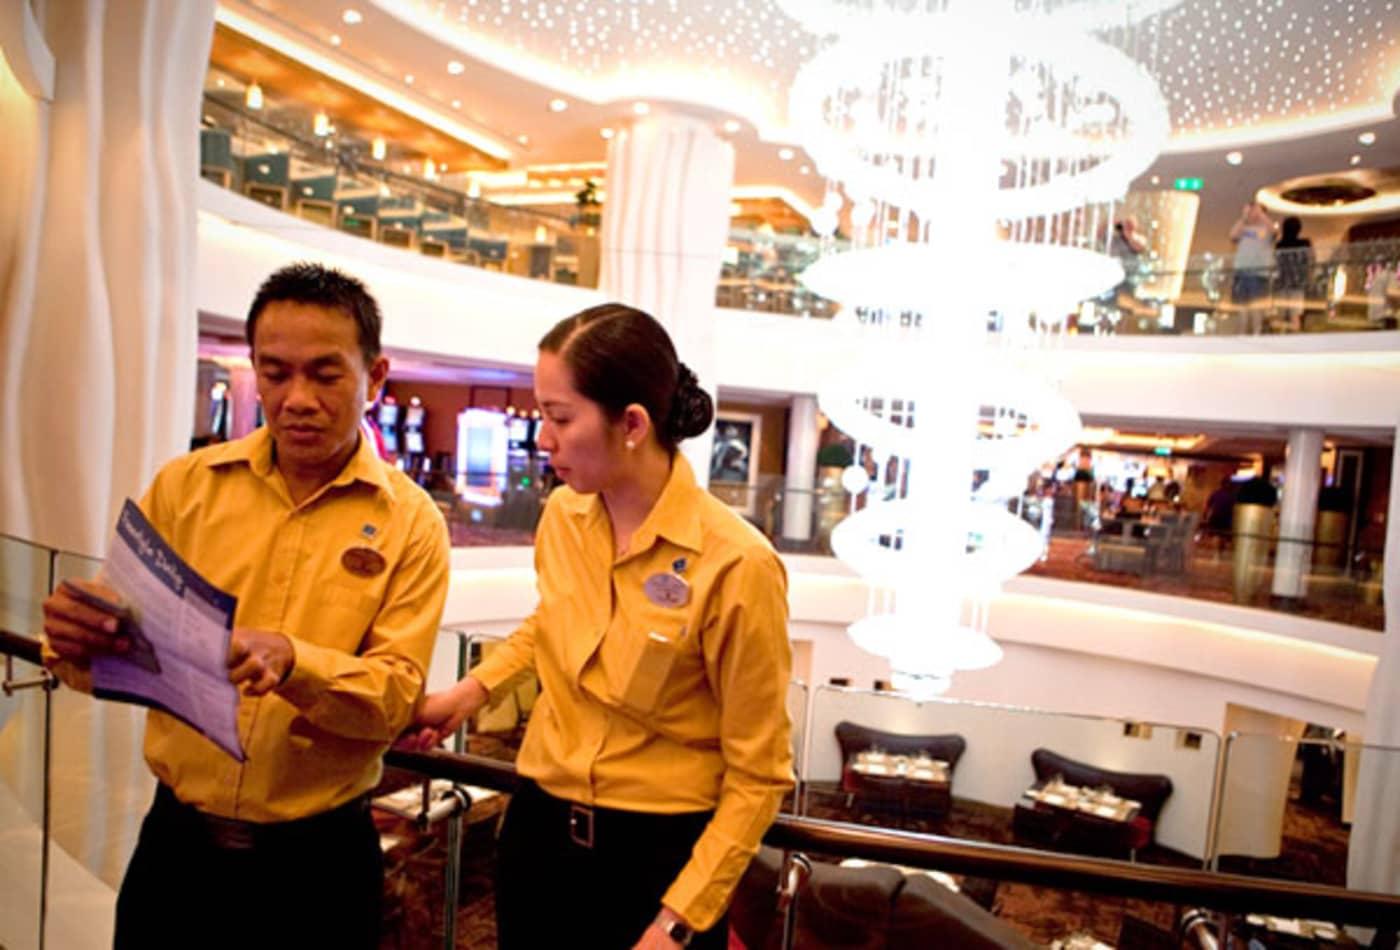 Cruise-Ship-Social-Director-Easy-High-Paying-Jobs-CNBC.jpg